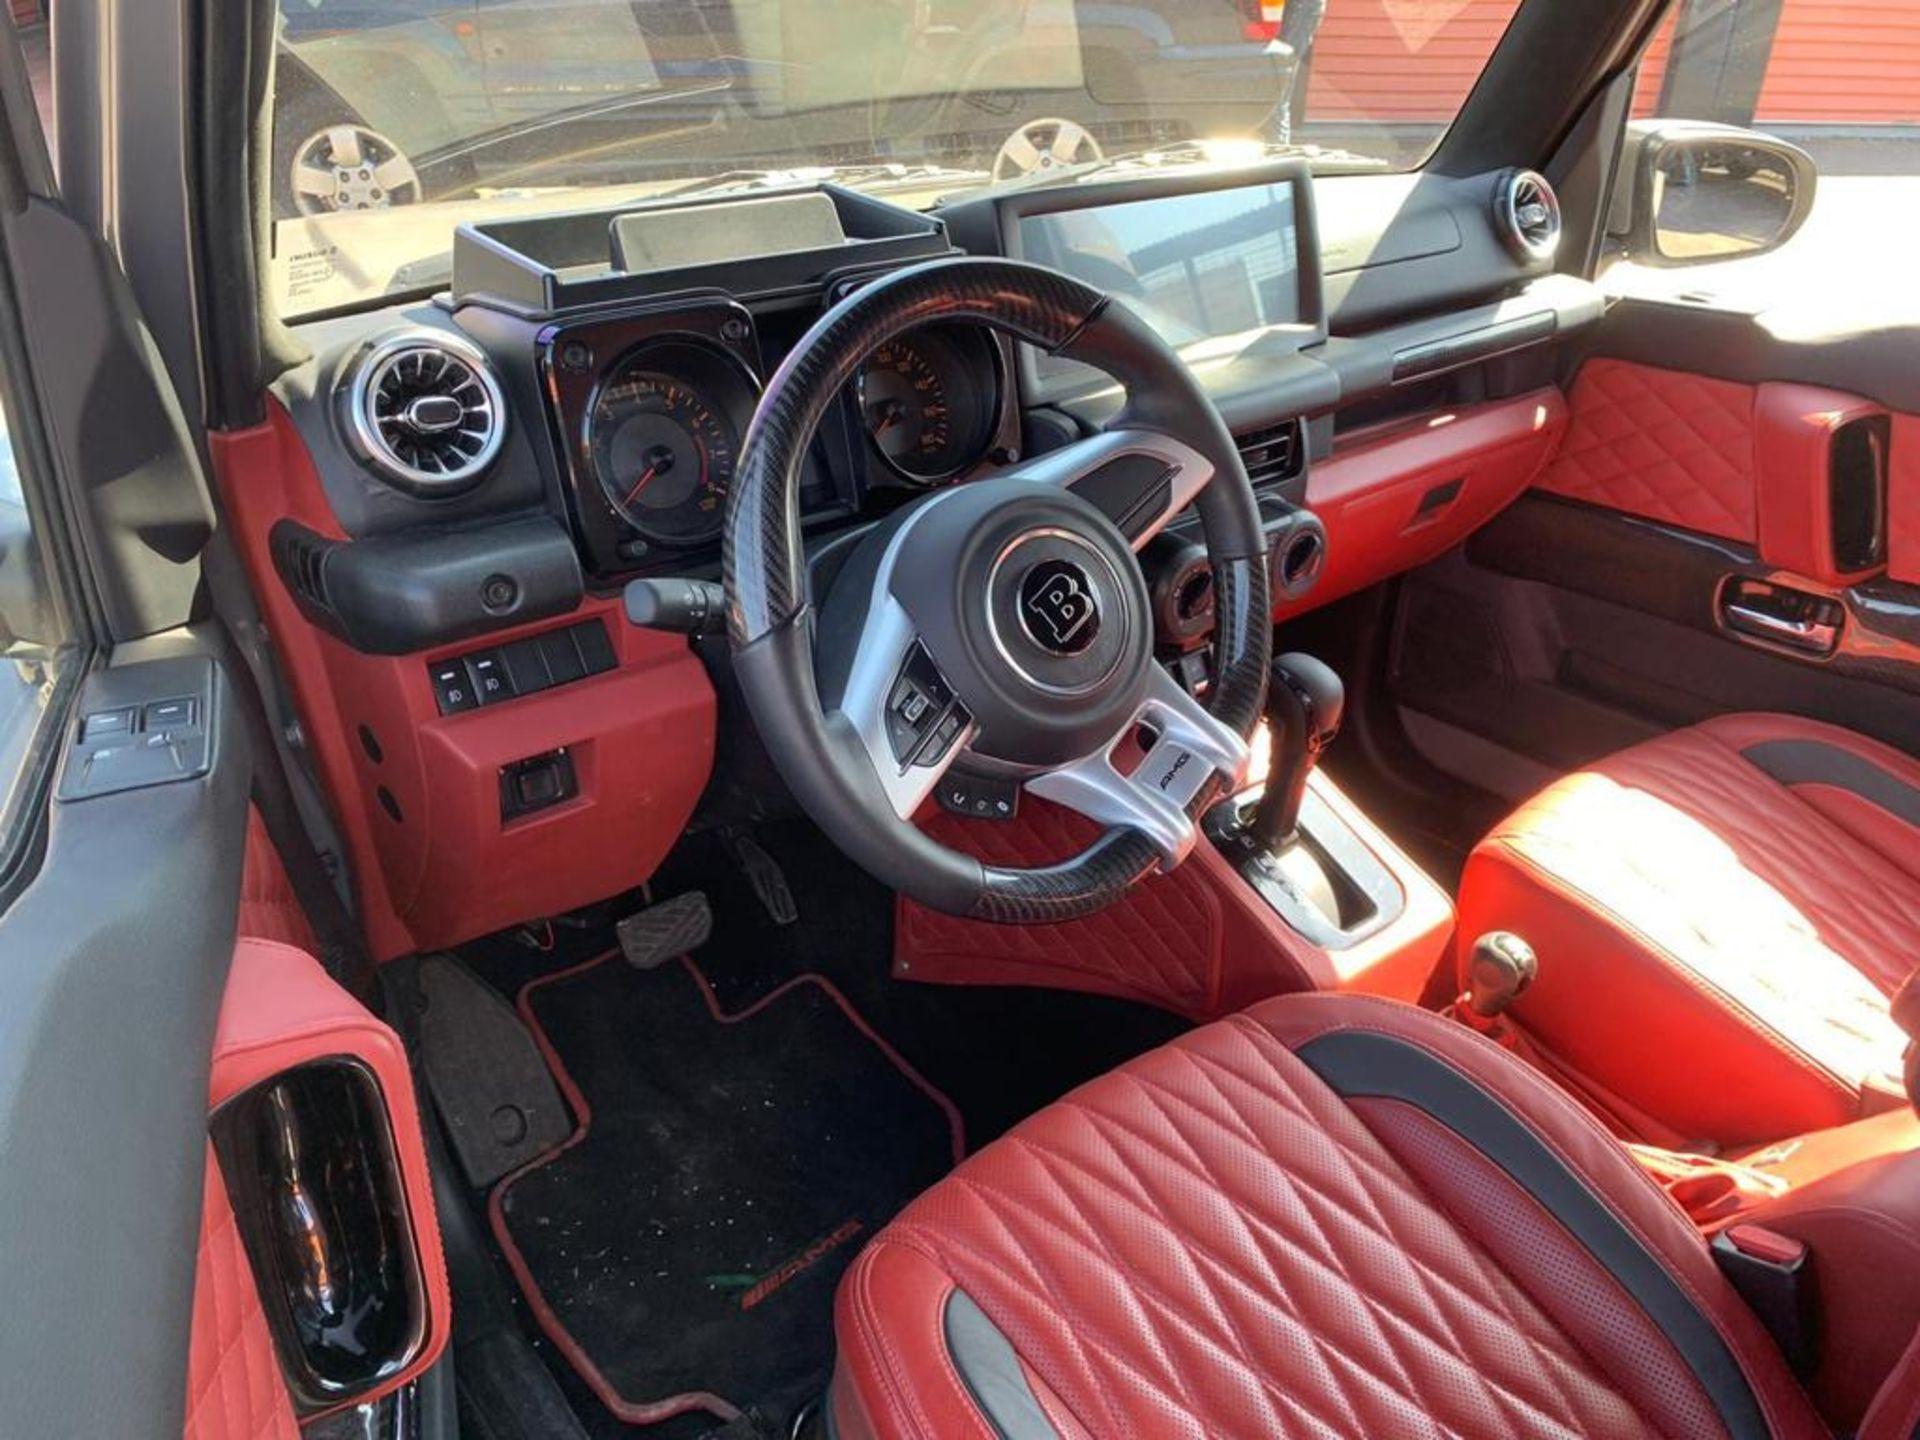 *RESERVE MET* - 2019 Suzuki Jimny Converted to Mini G - Mini Mercedes G Wagon G63 Brabus. - Image 2 of 6